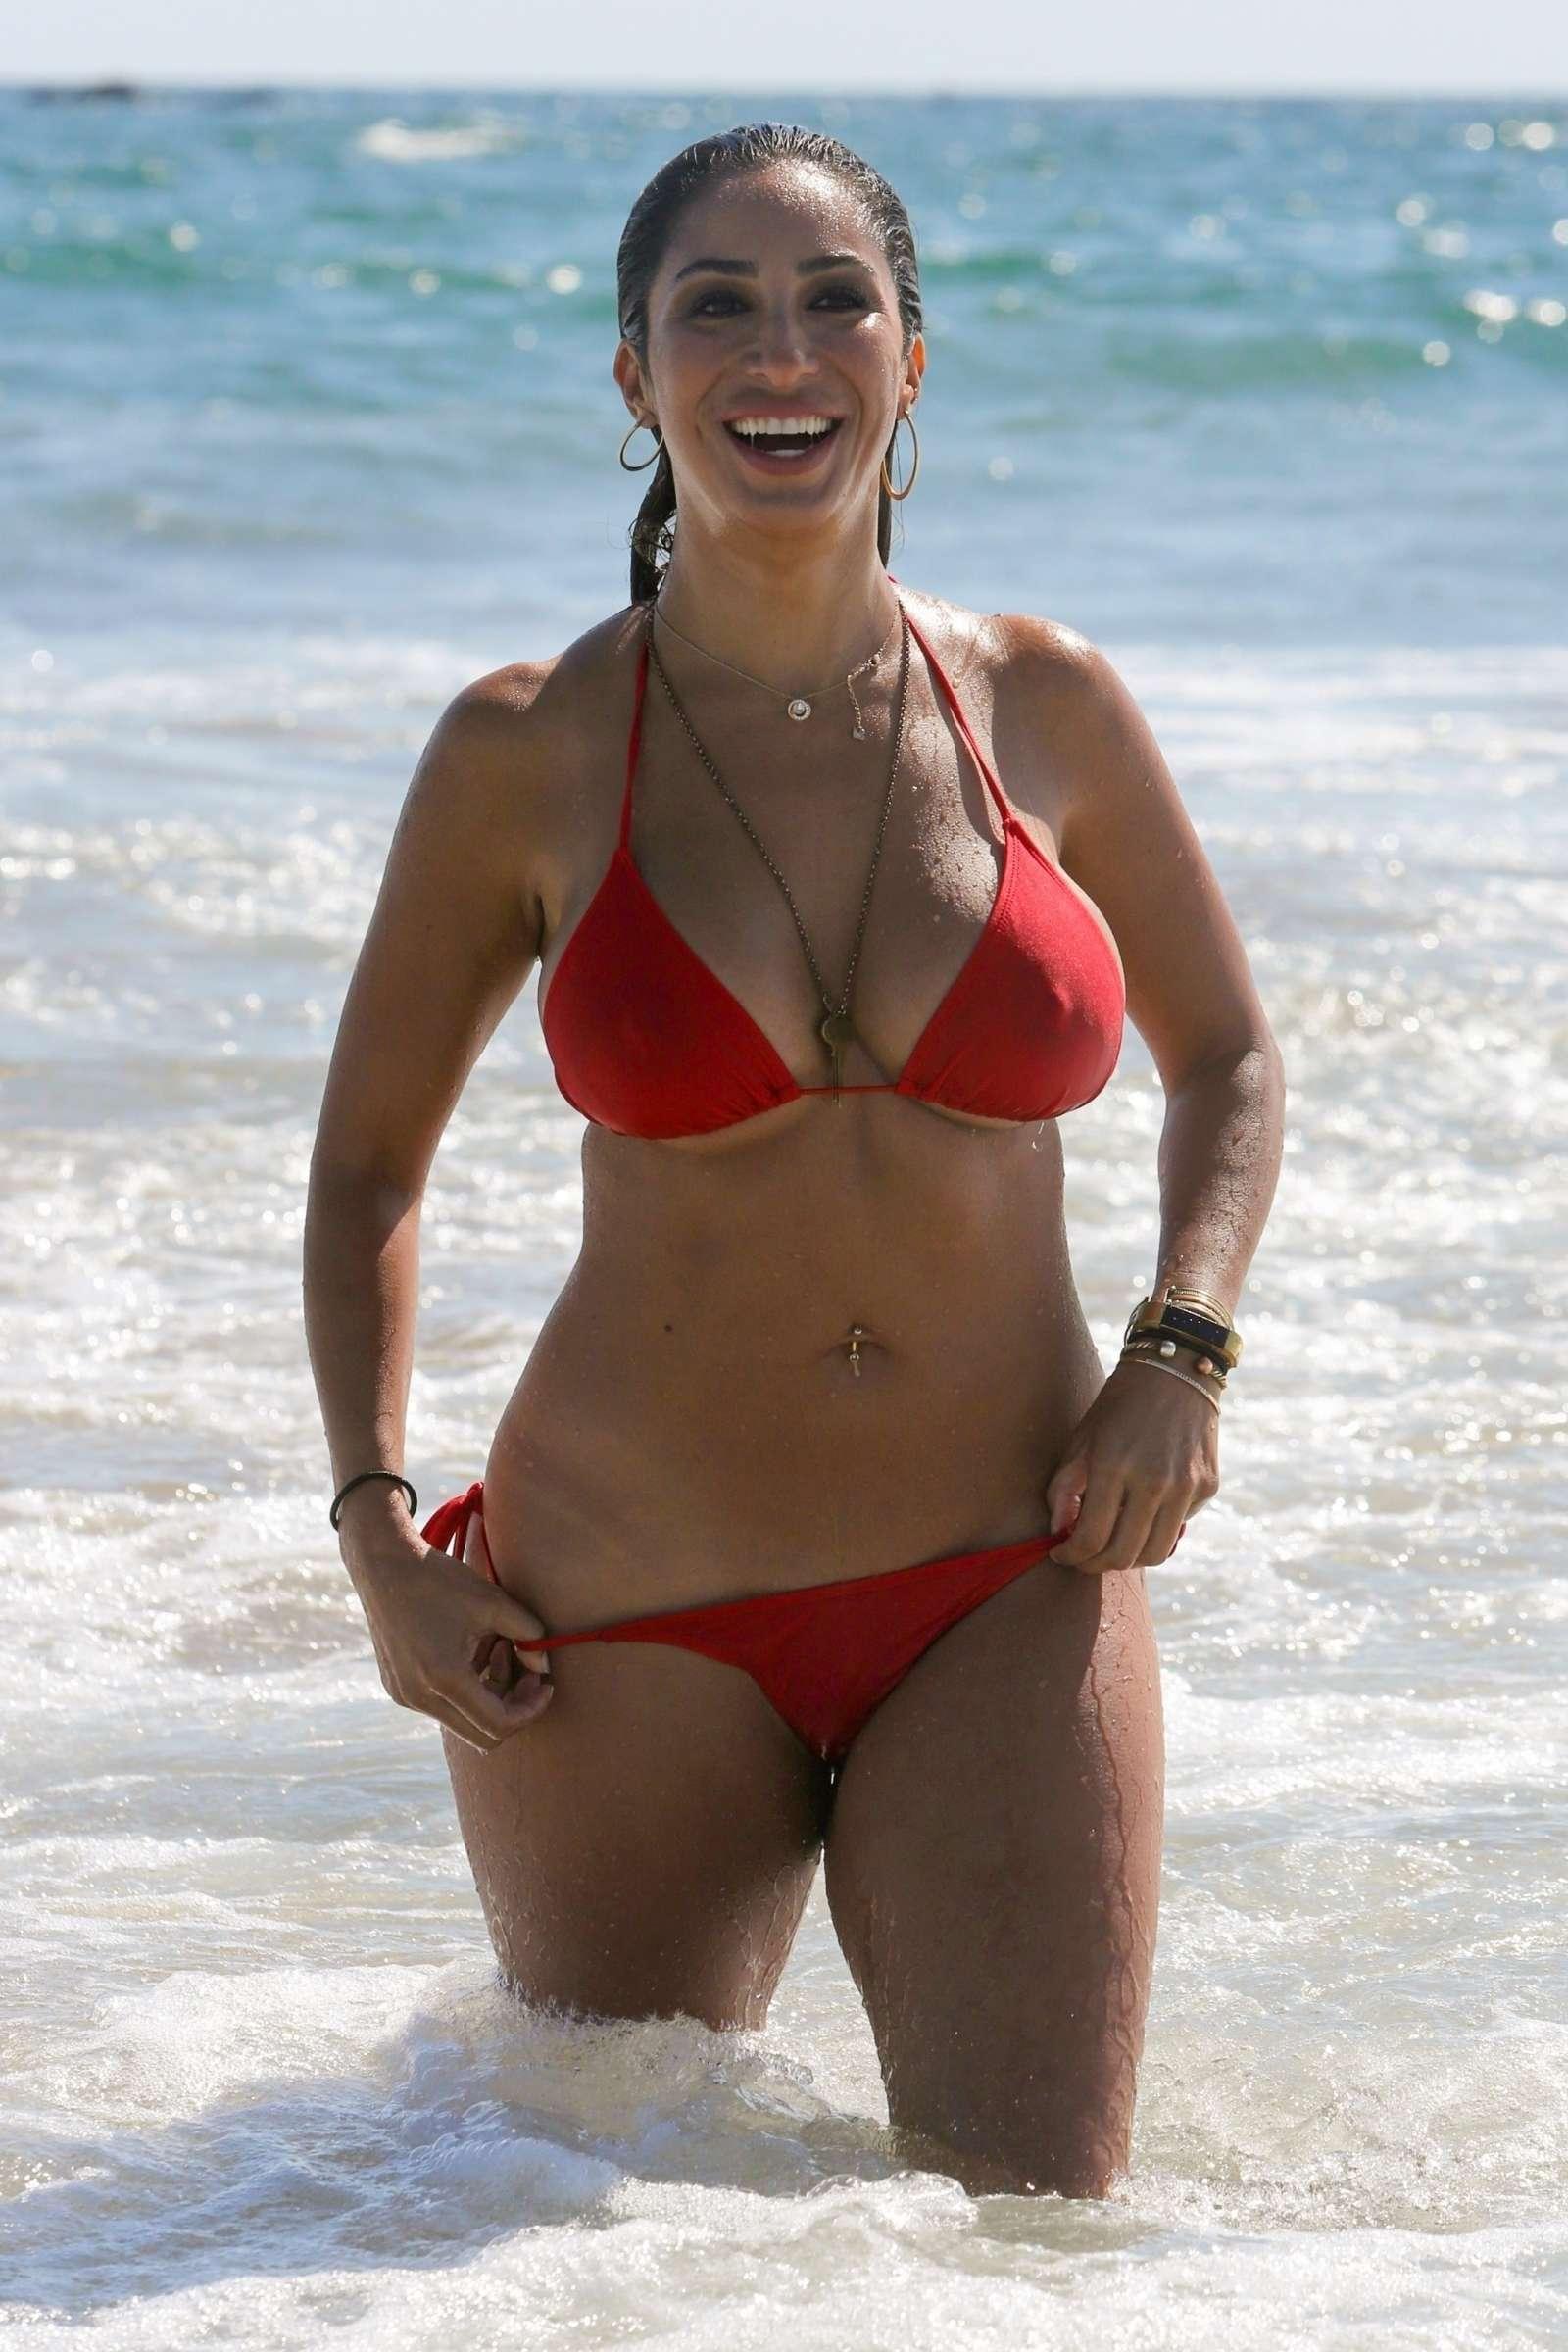 BETHENNY FRANKEL in Bikini at a Beach in Miami on New Year